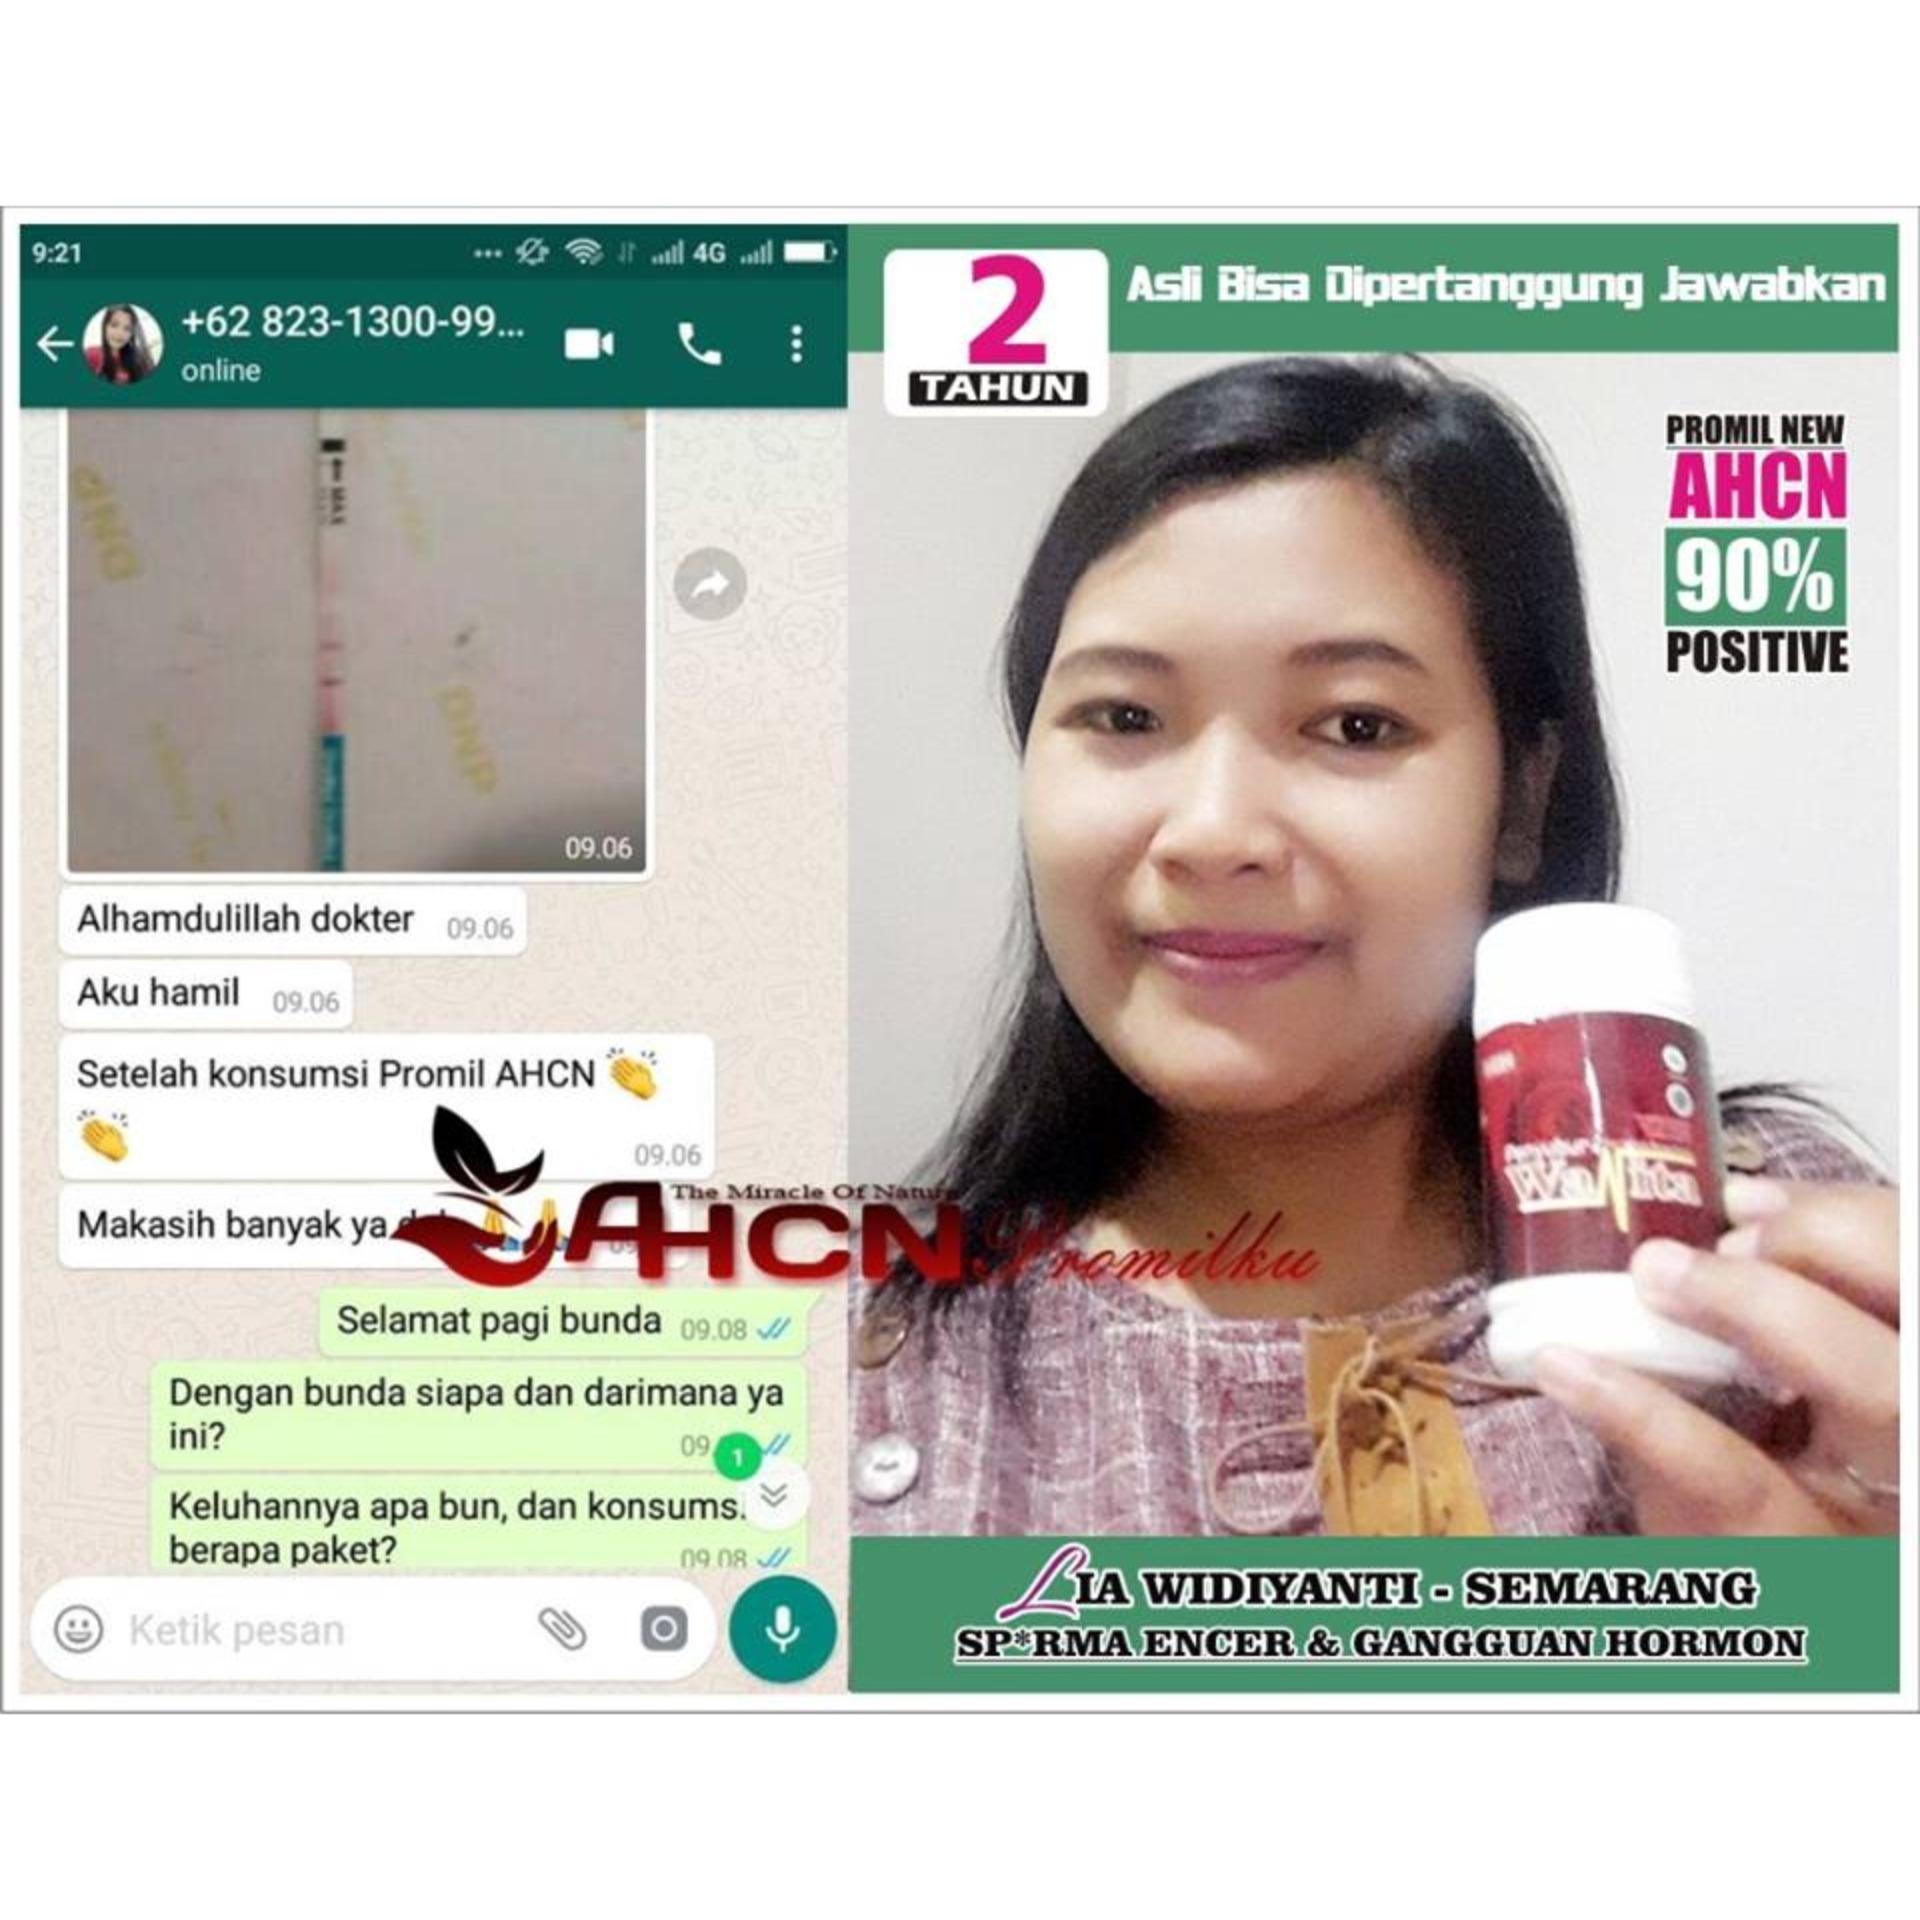 Obat Penyubur Kandungan Wanita Sperma Air Mani Pria Ahcn Paket Pengental Penambah Agar Cepat Hamil Dan Punya Anak Mandul